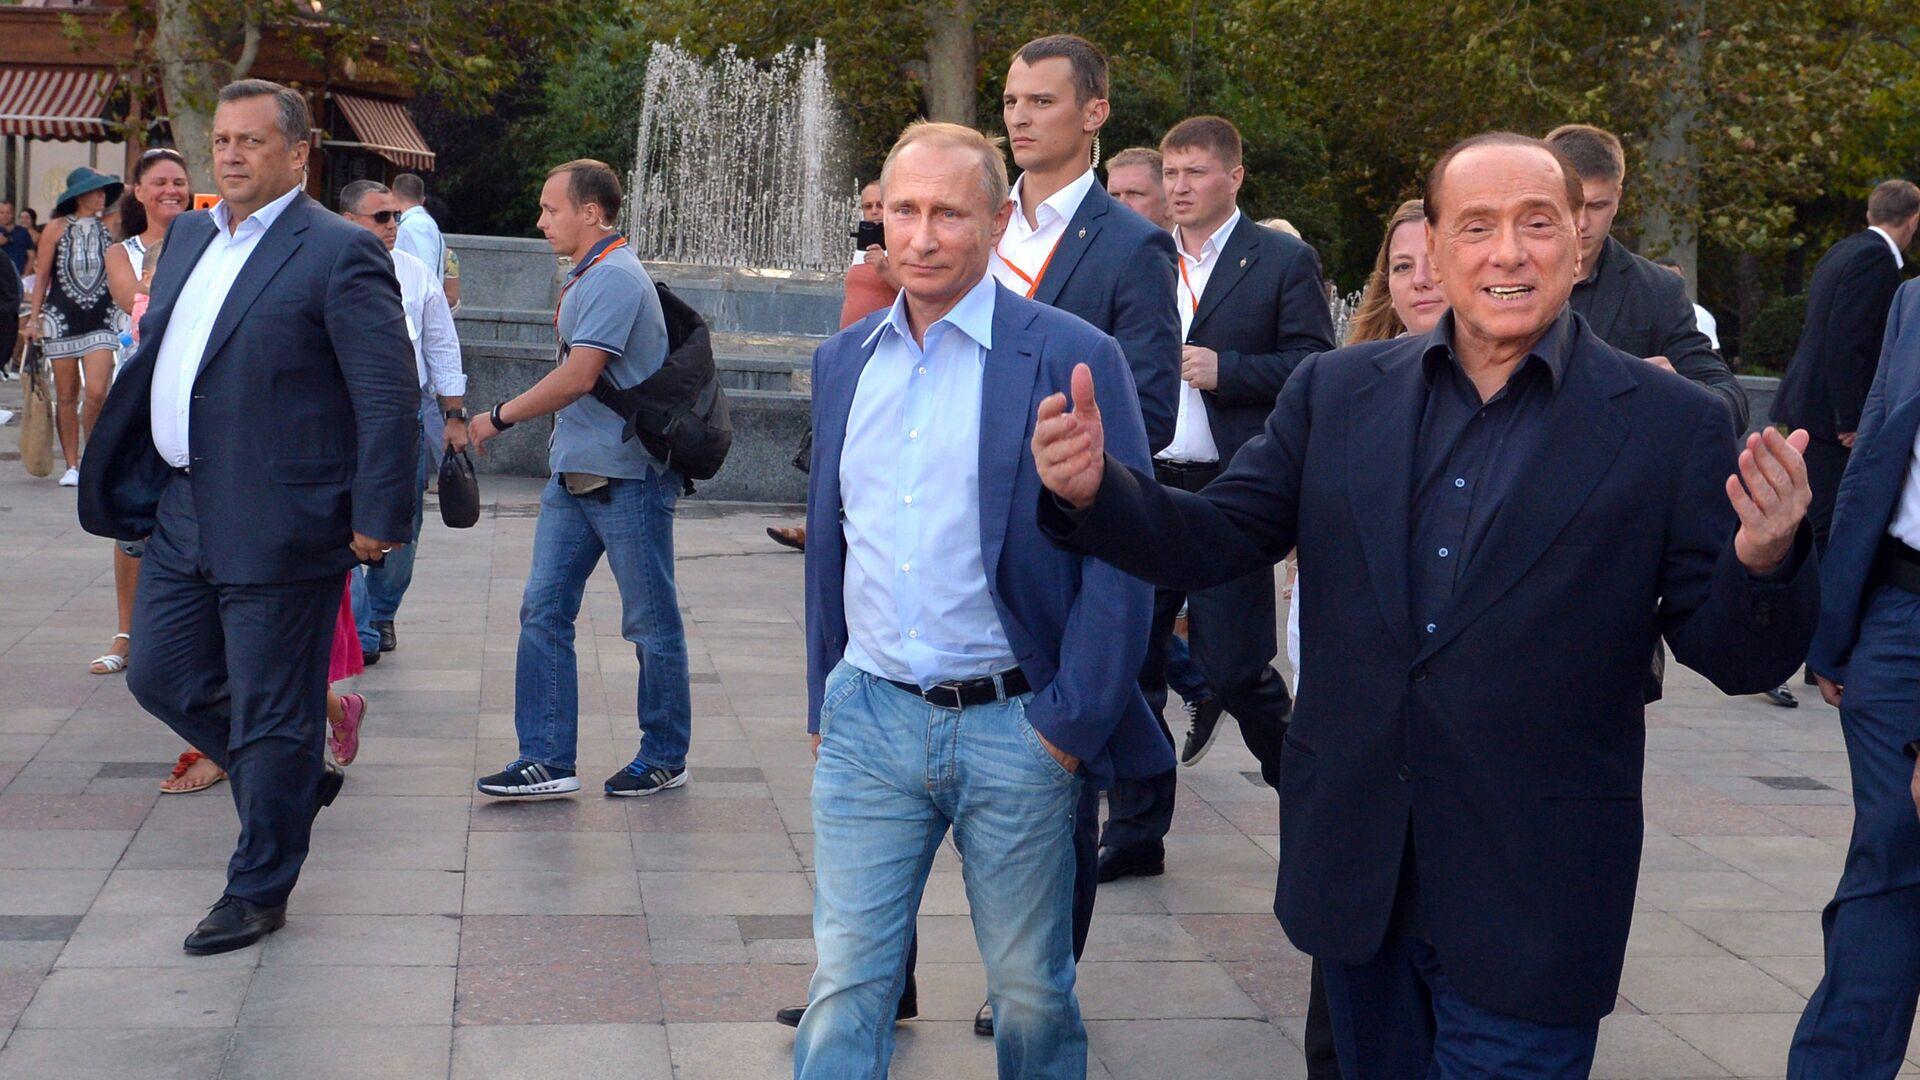 Russian President Vladimir Putin (3rd R) and Italy's former prime minister Silvio Berlusconi (R) walk along the Yalta embankment in Crimea on September 11, 2015 - Sputnik Italia, 1920, 29.09.2021